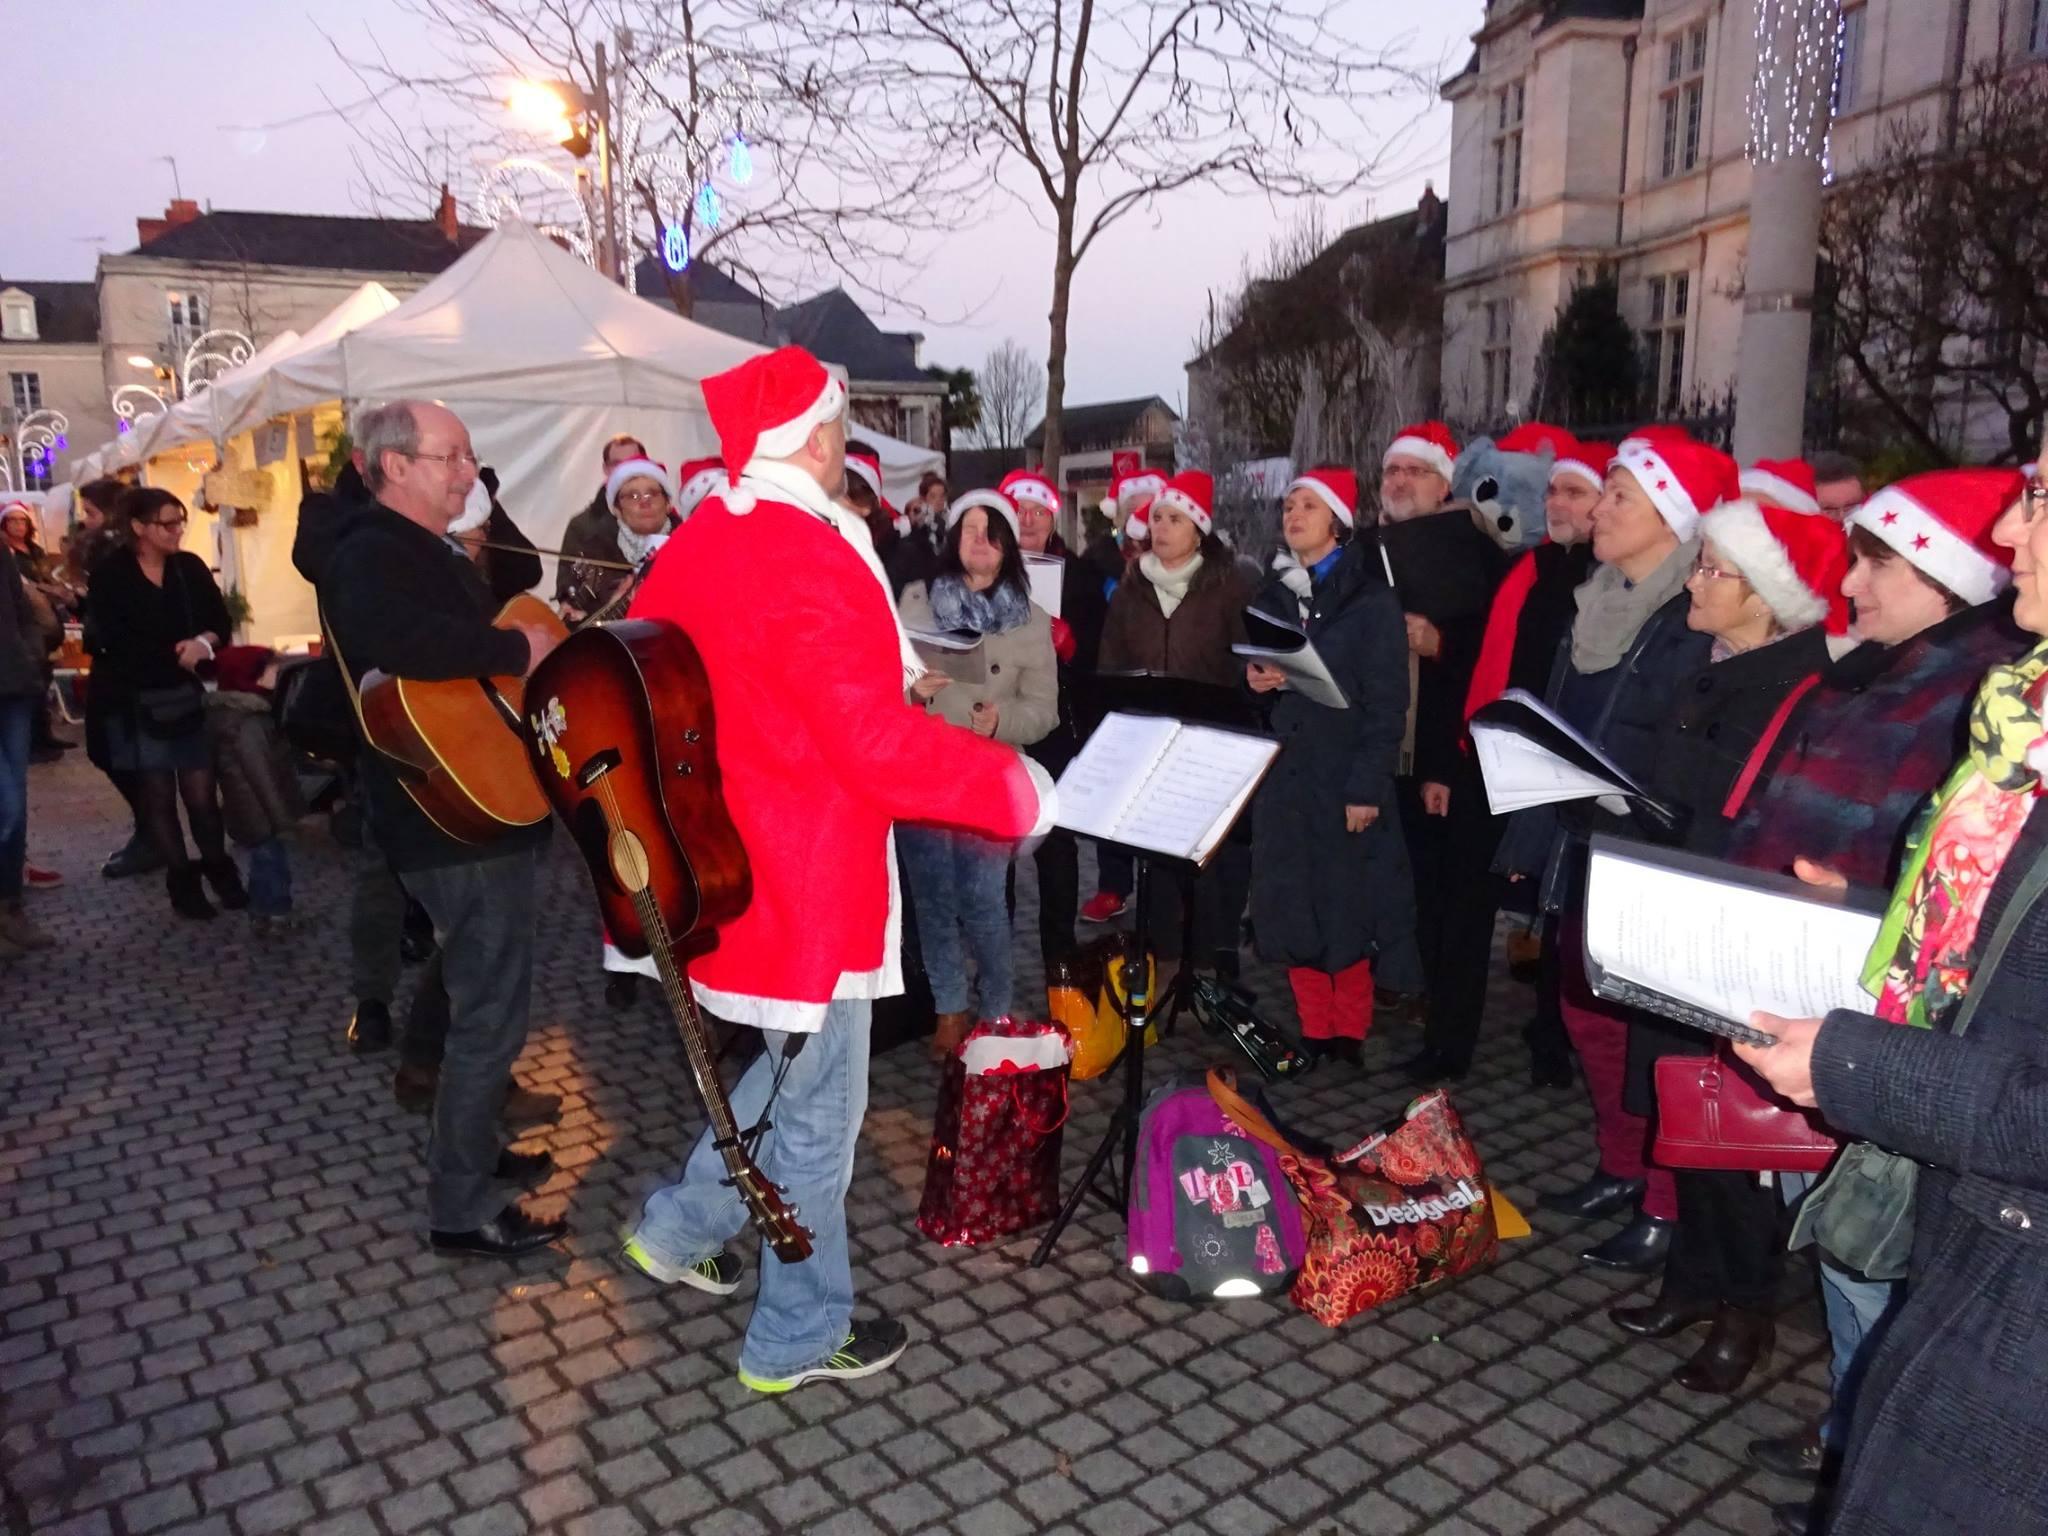 2015-12-12 – Au marché de Noël (6) Sabrina